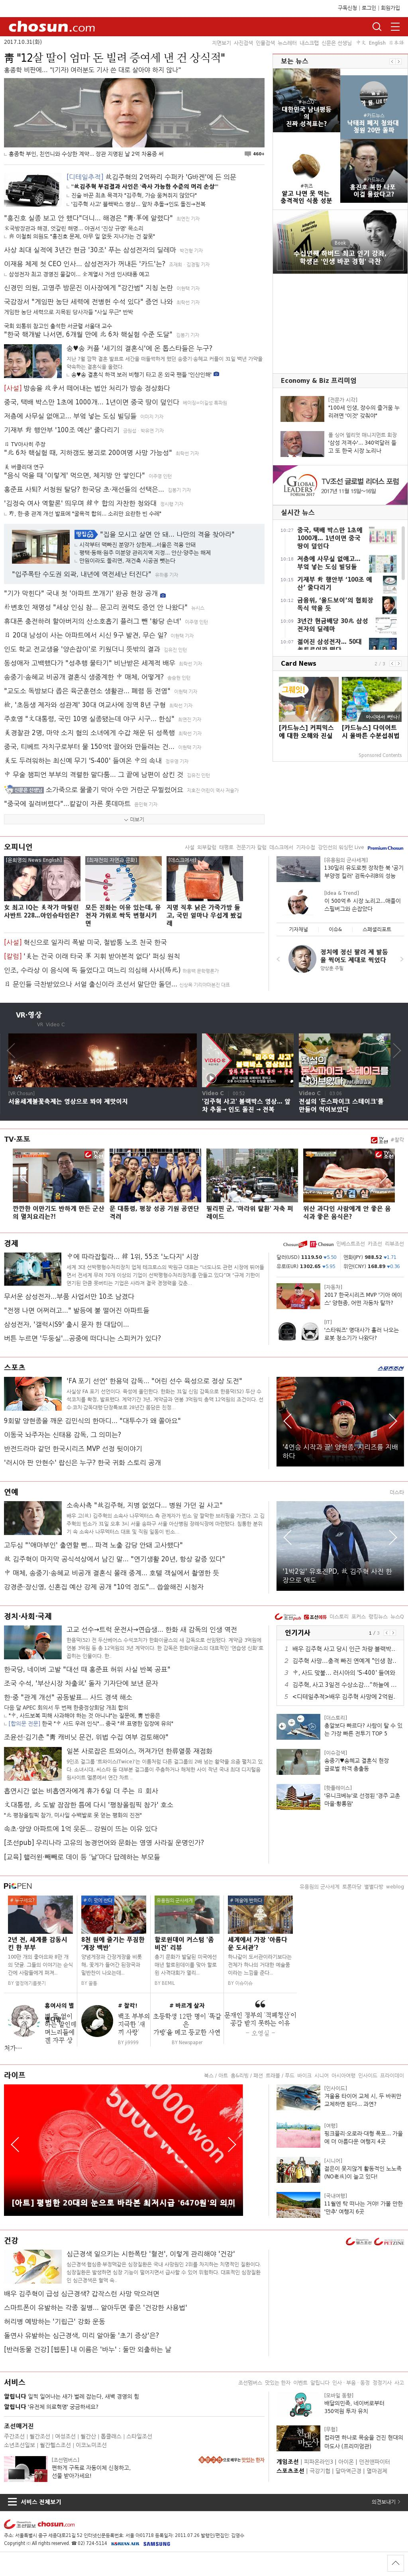 chosun.com at Tuesday Oct. 31, 2017, 11:01 a.m. UTC